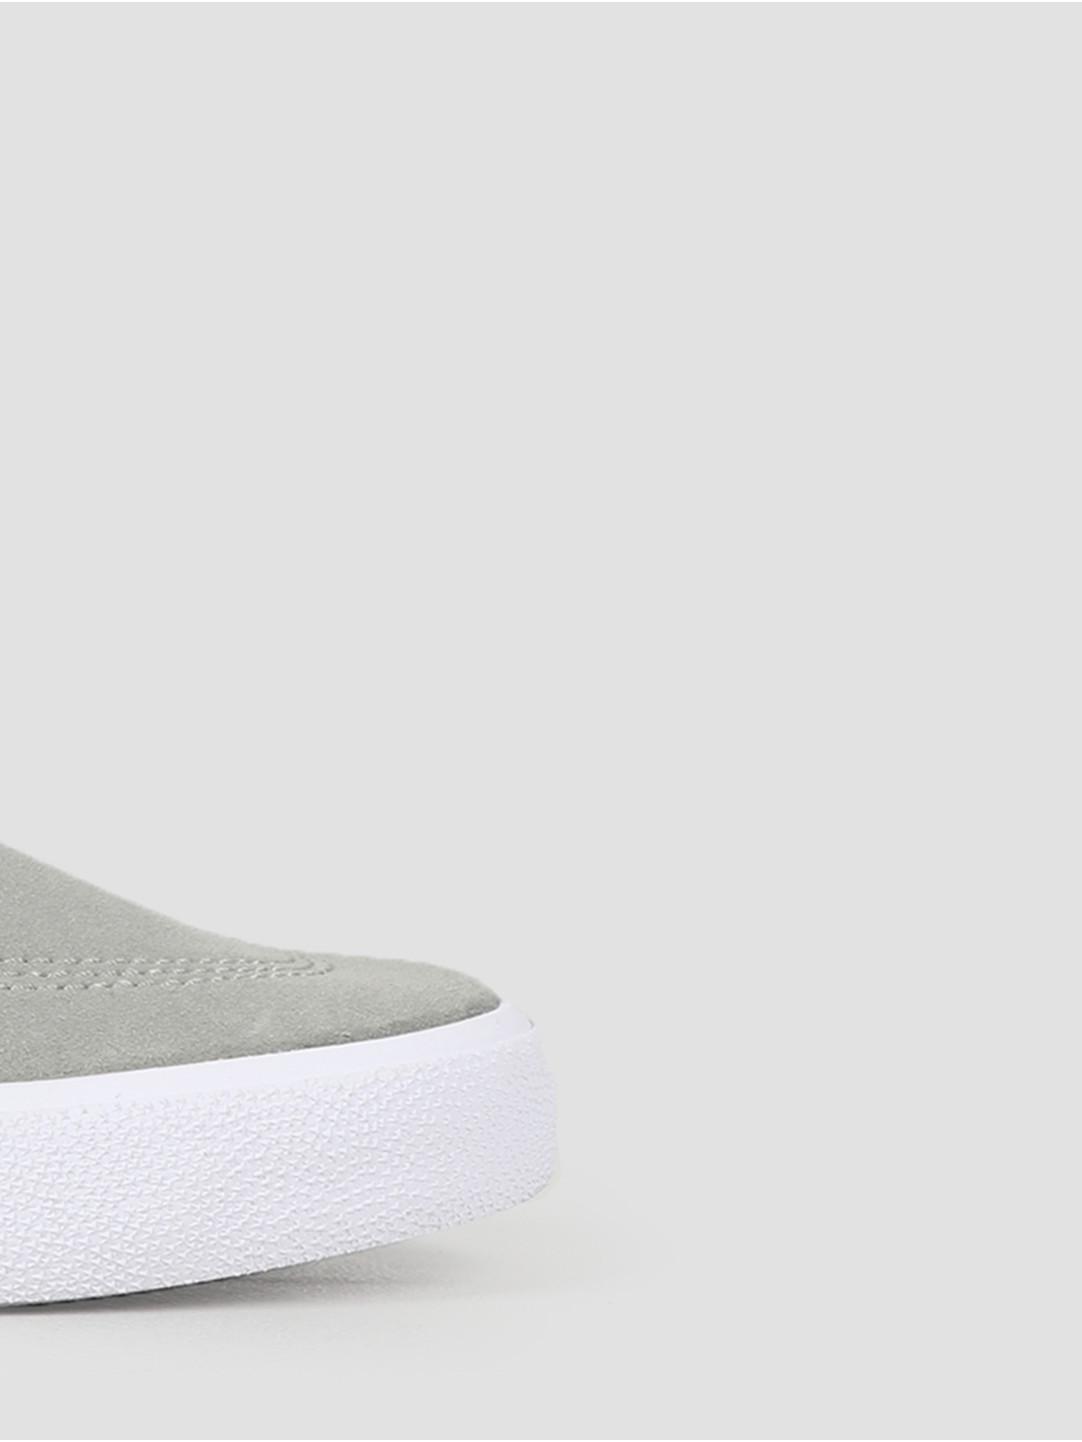 Nike Nike SB Zoom Stefan Janoski RM Premium Jade Horizon Black-Jade Horizon-White Ci2231-300